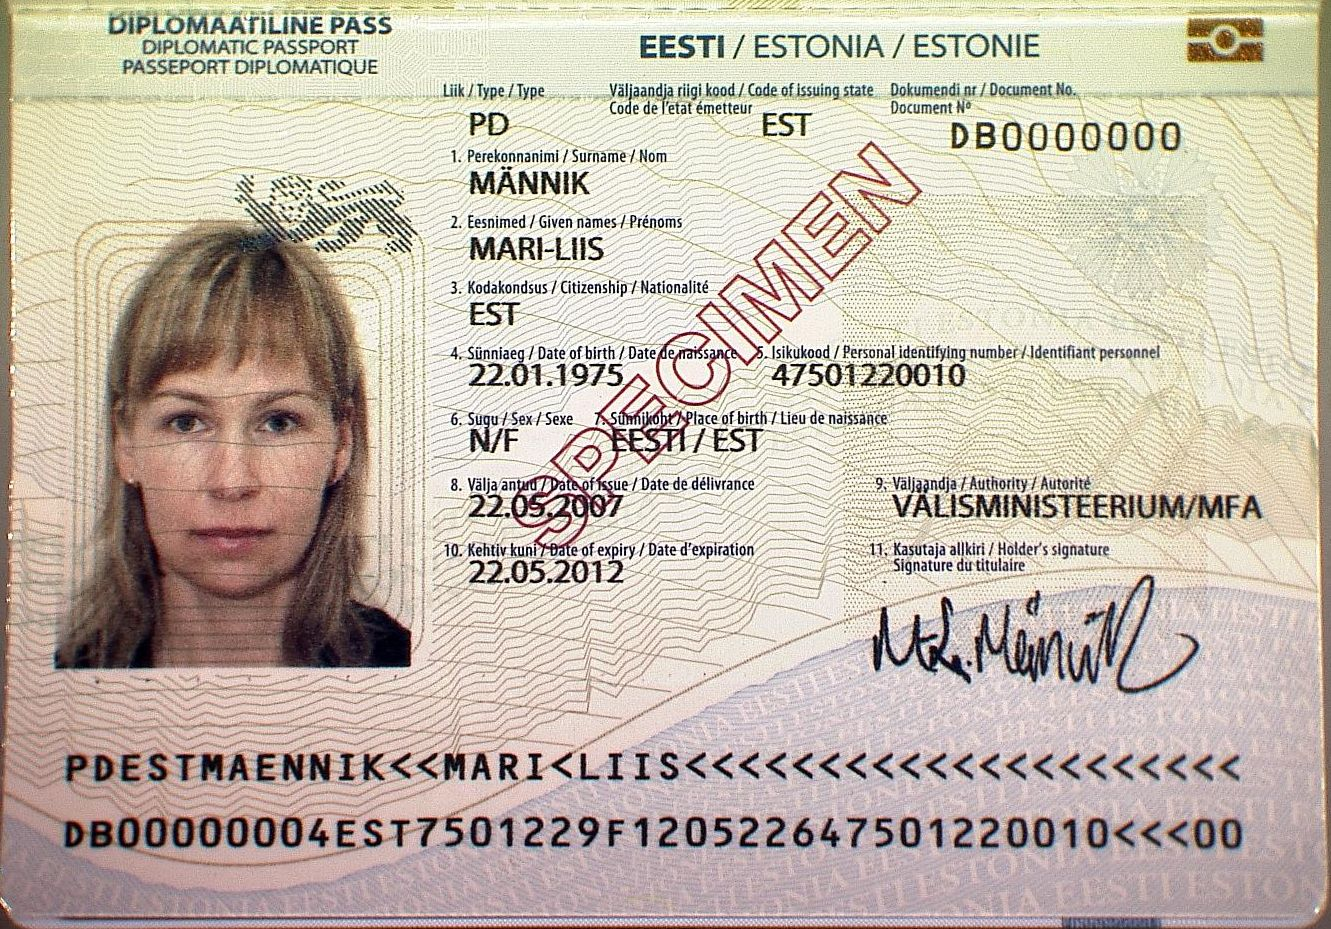 Дипломатический паспорт эстонца